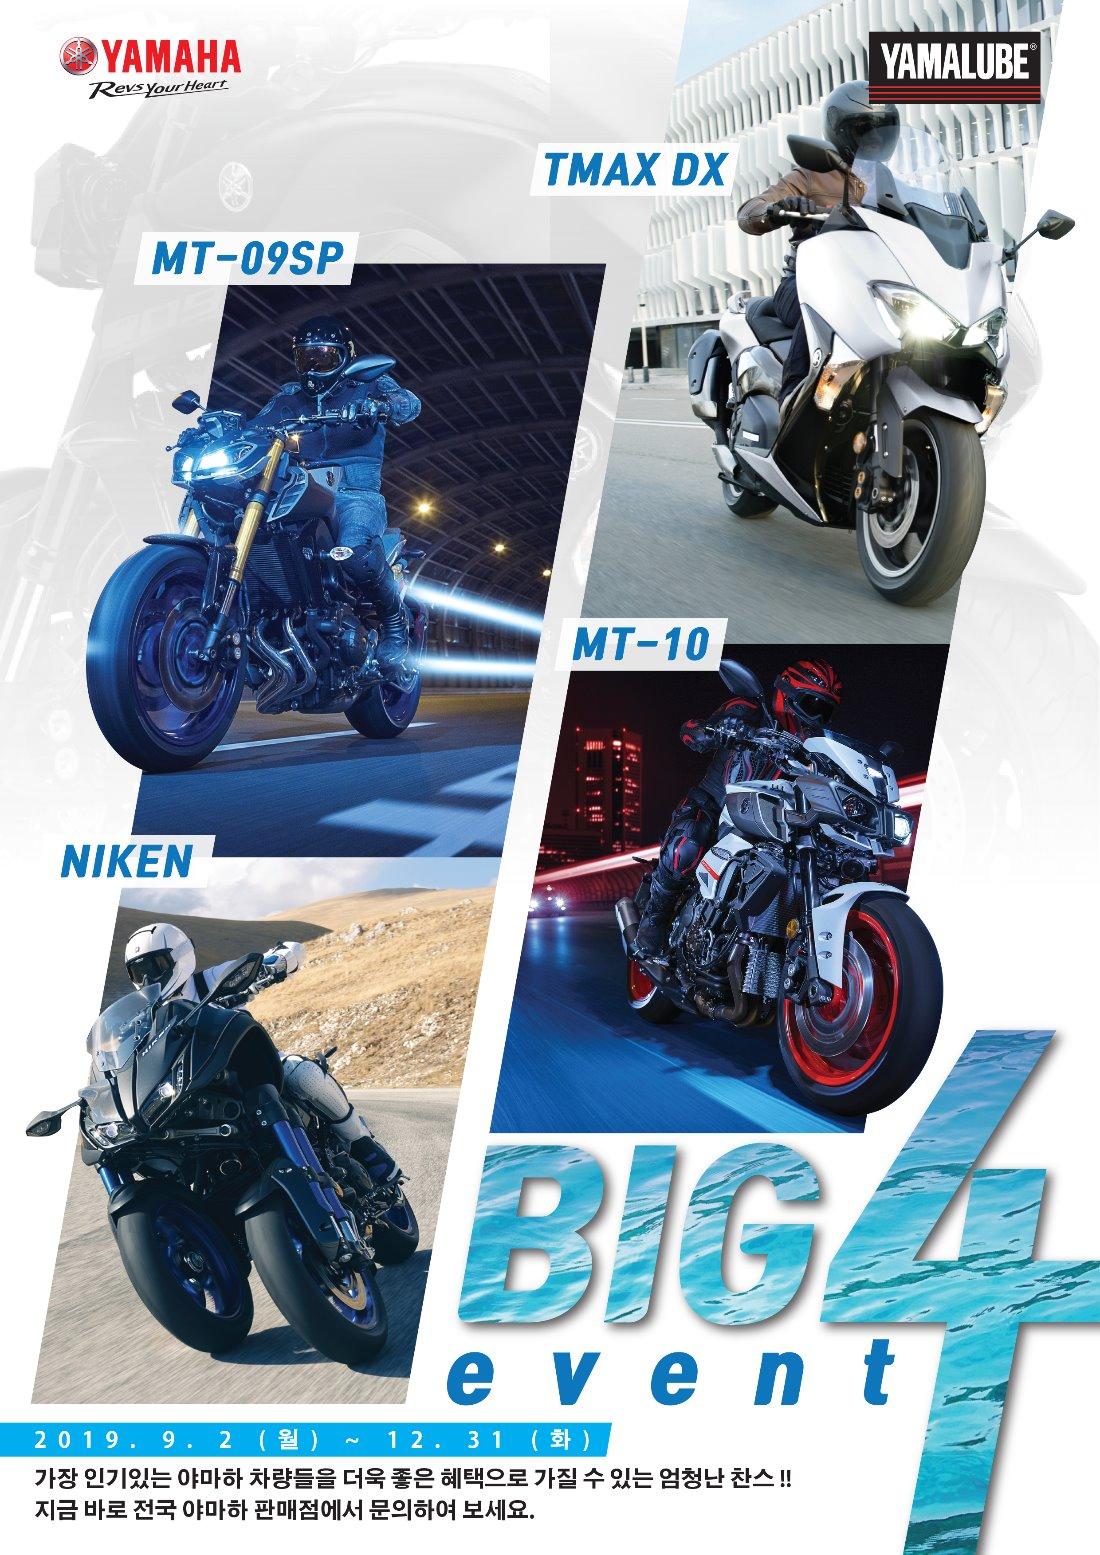 BIG4 event-1.jpg